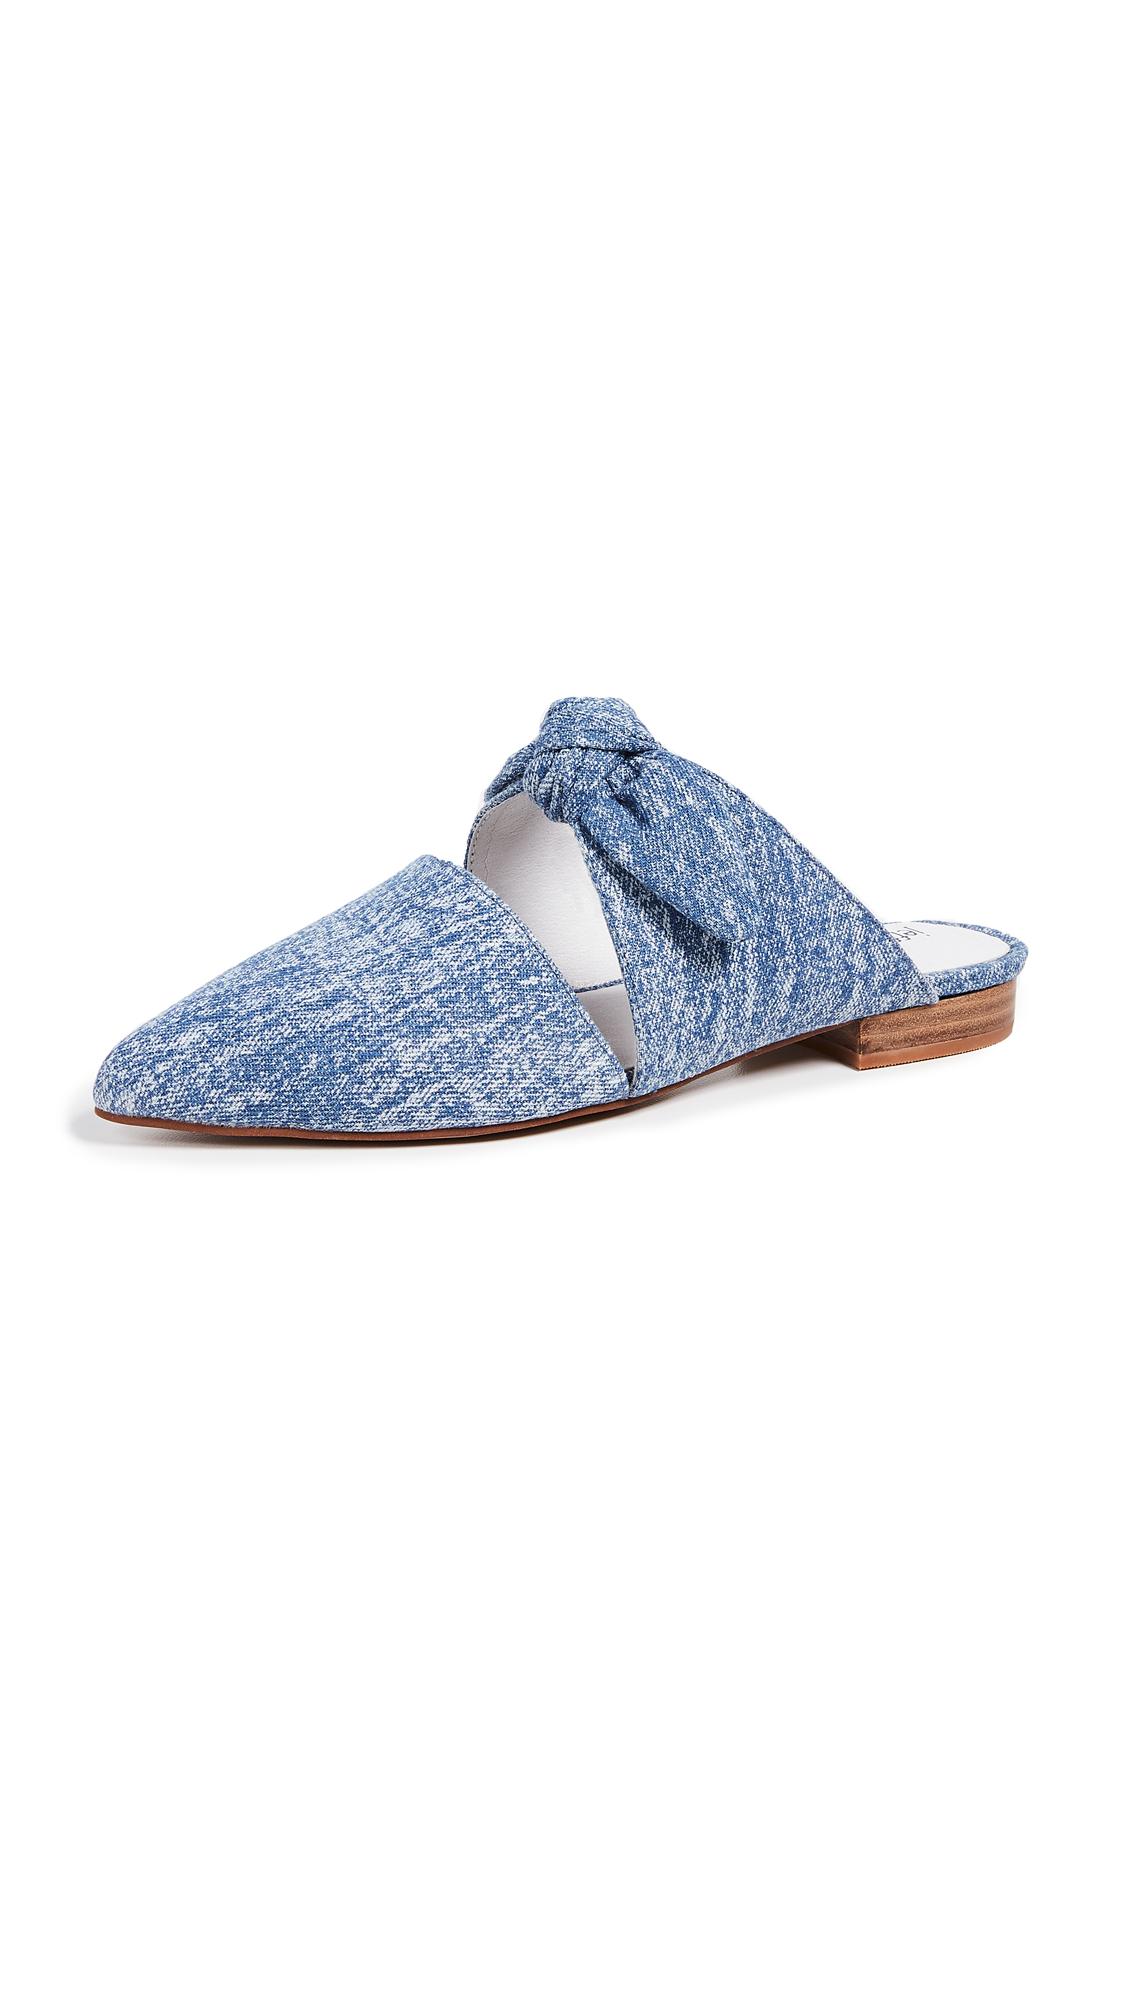 Jeffrey Campbell Charlin Point Toe Mules - Blue Denim